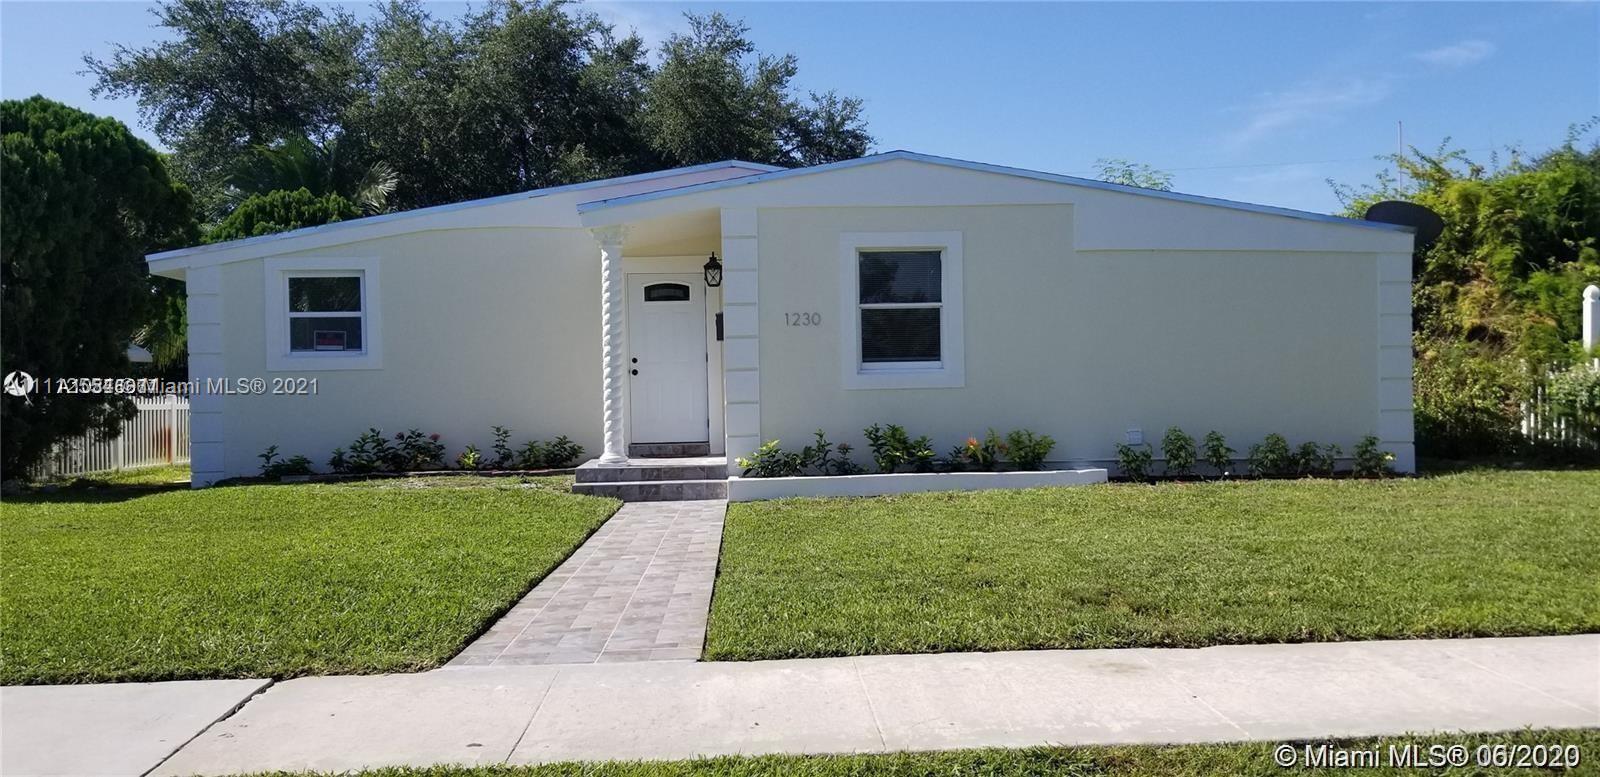 1230 NE 158th St, North Miami Beach, Florida 33162, ,Residential Income,For Sale,158th St,A11112554